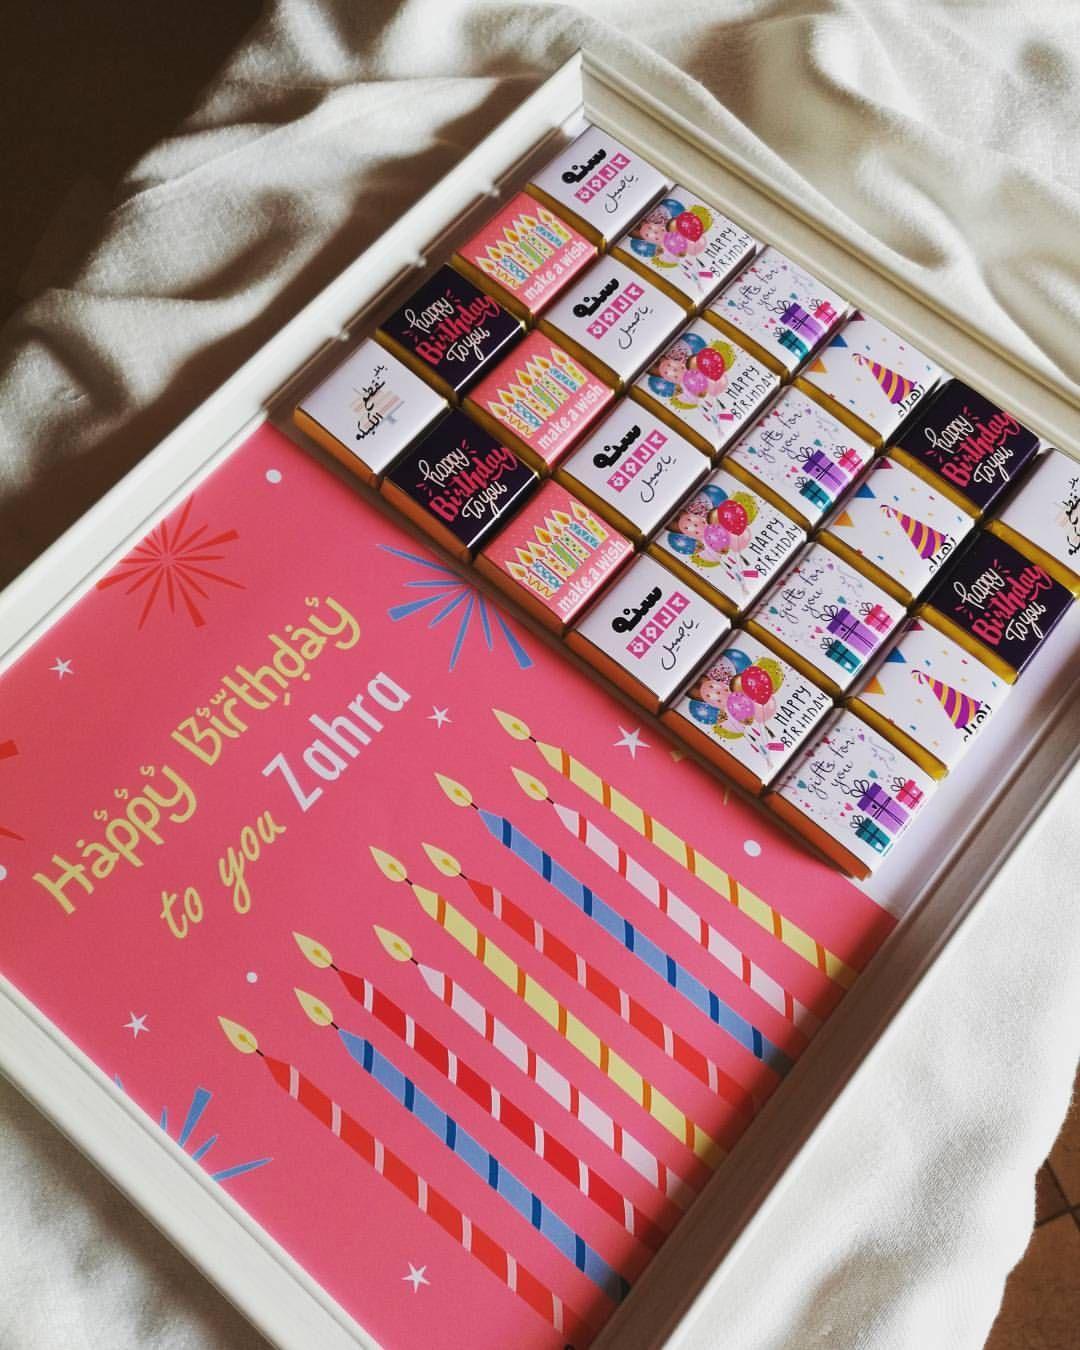 شوكولاته تغليف شوكولاته توزيعات برواز شوكولاته هدايا عيد ميلاد Eid Stickers Graduation Diy Diva Birthday Parties